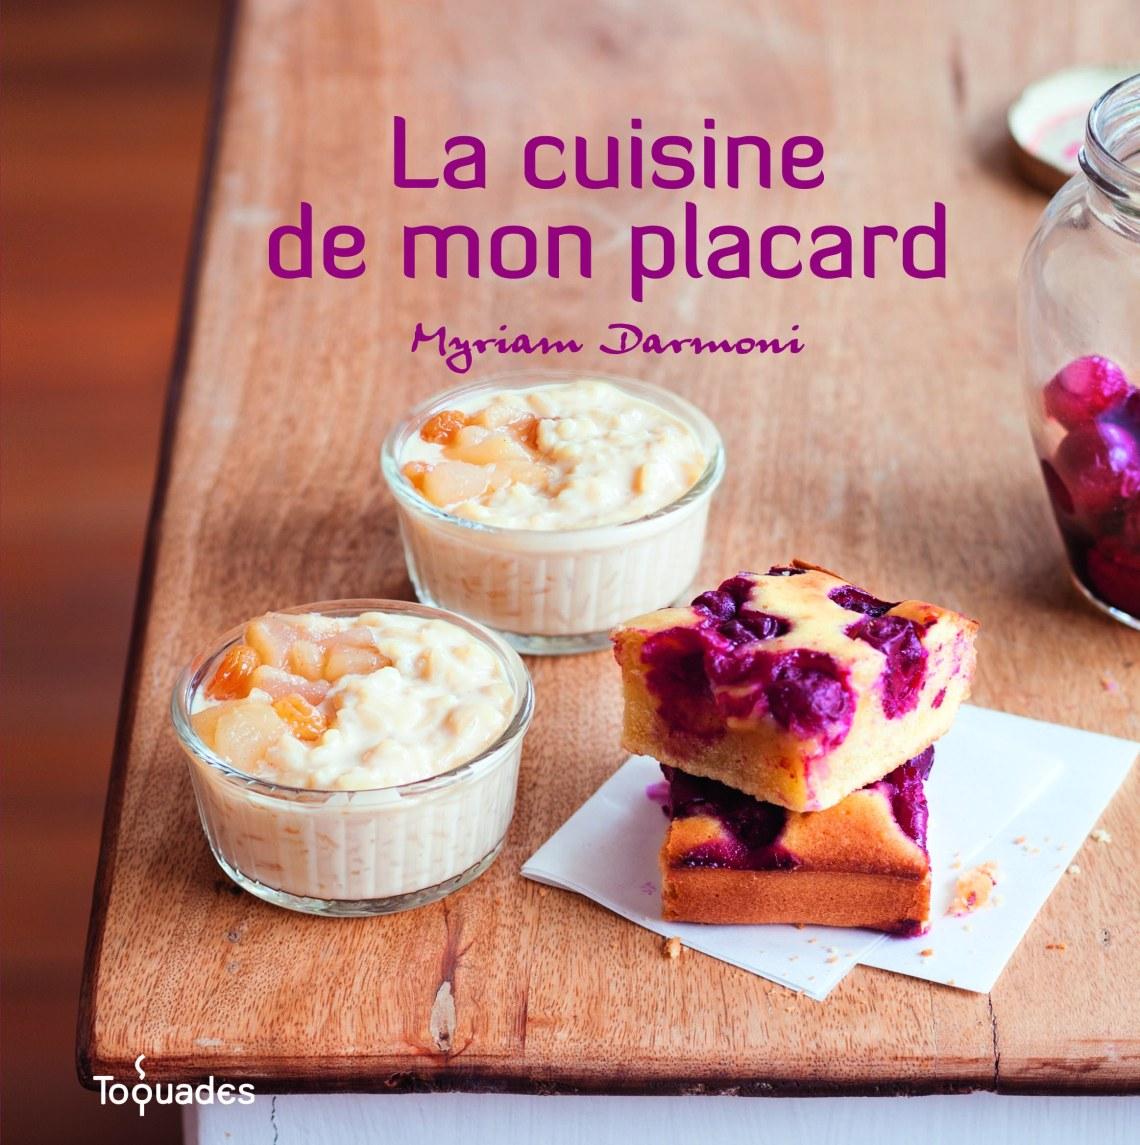 La cuisine de mon placard, Myriam Darmoni, ed. First